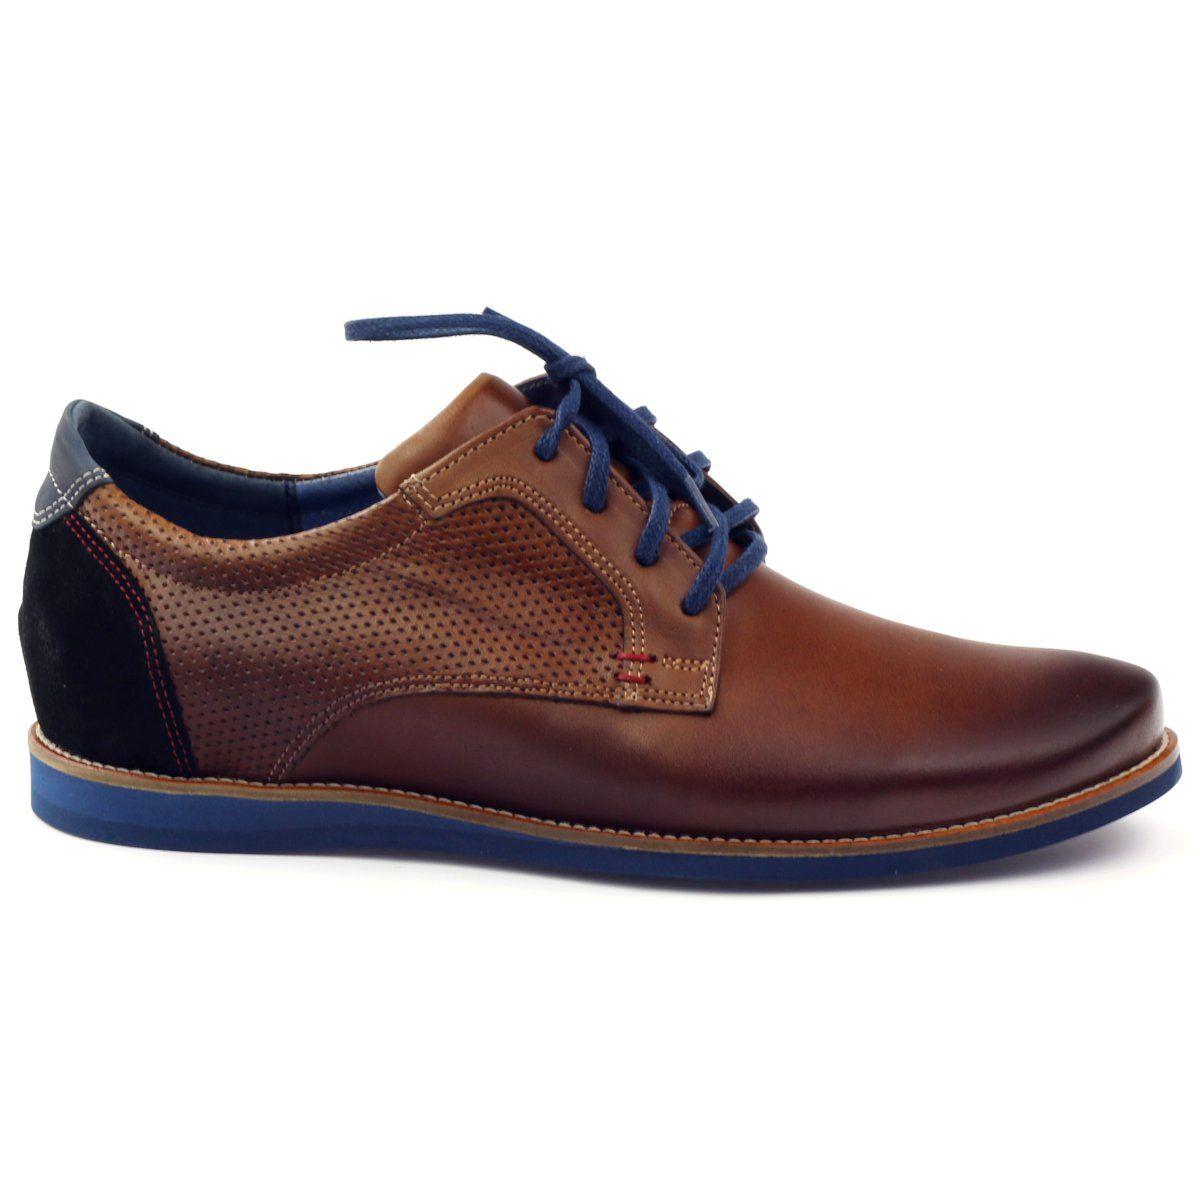 Casual Polbuty Meskie Nikopol 1657 Brazowe Czarne Granatowe Brown Shoes Men Dress Shoes Men Shoes Mens